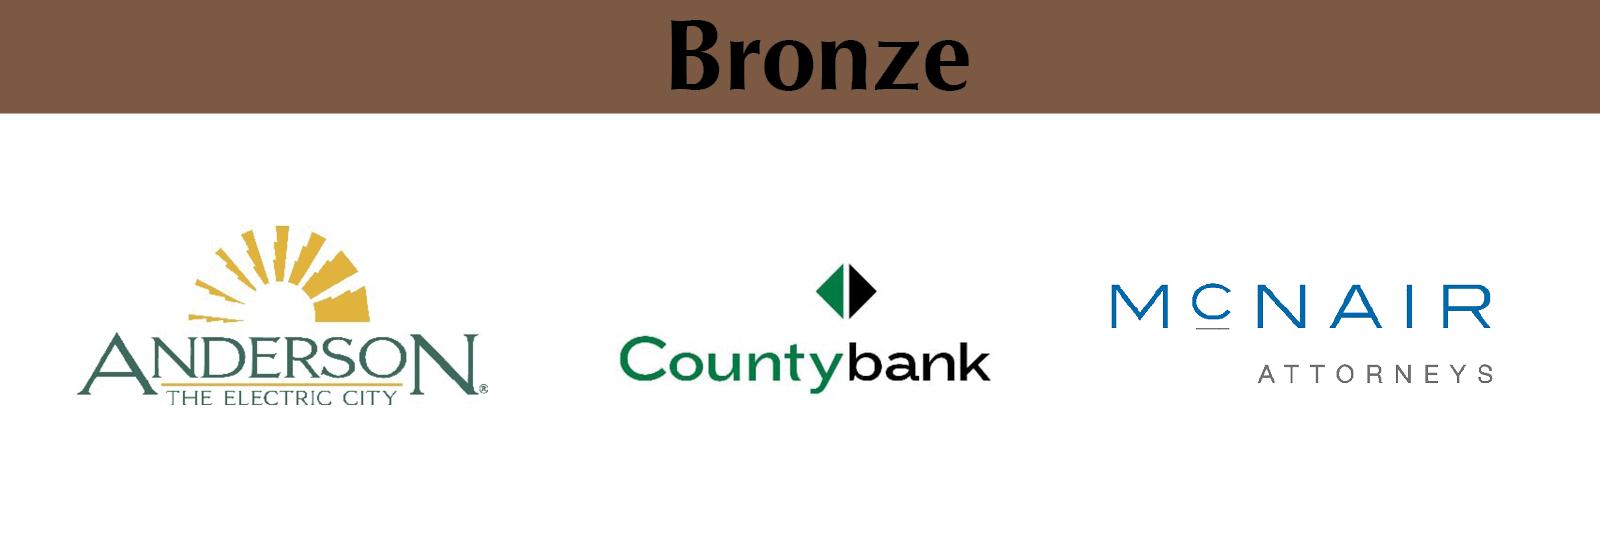 Bronze-sponsors-online.png-12.png